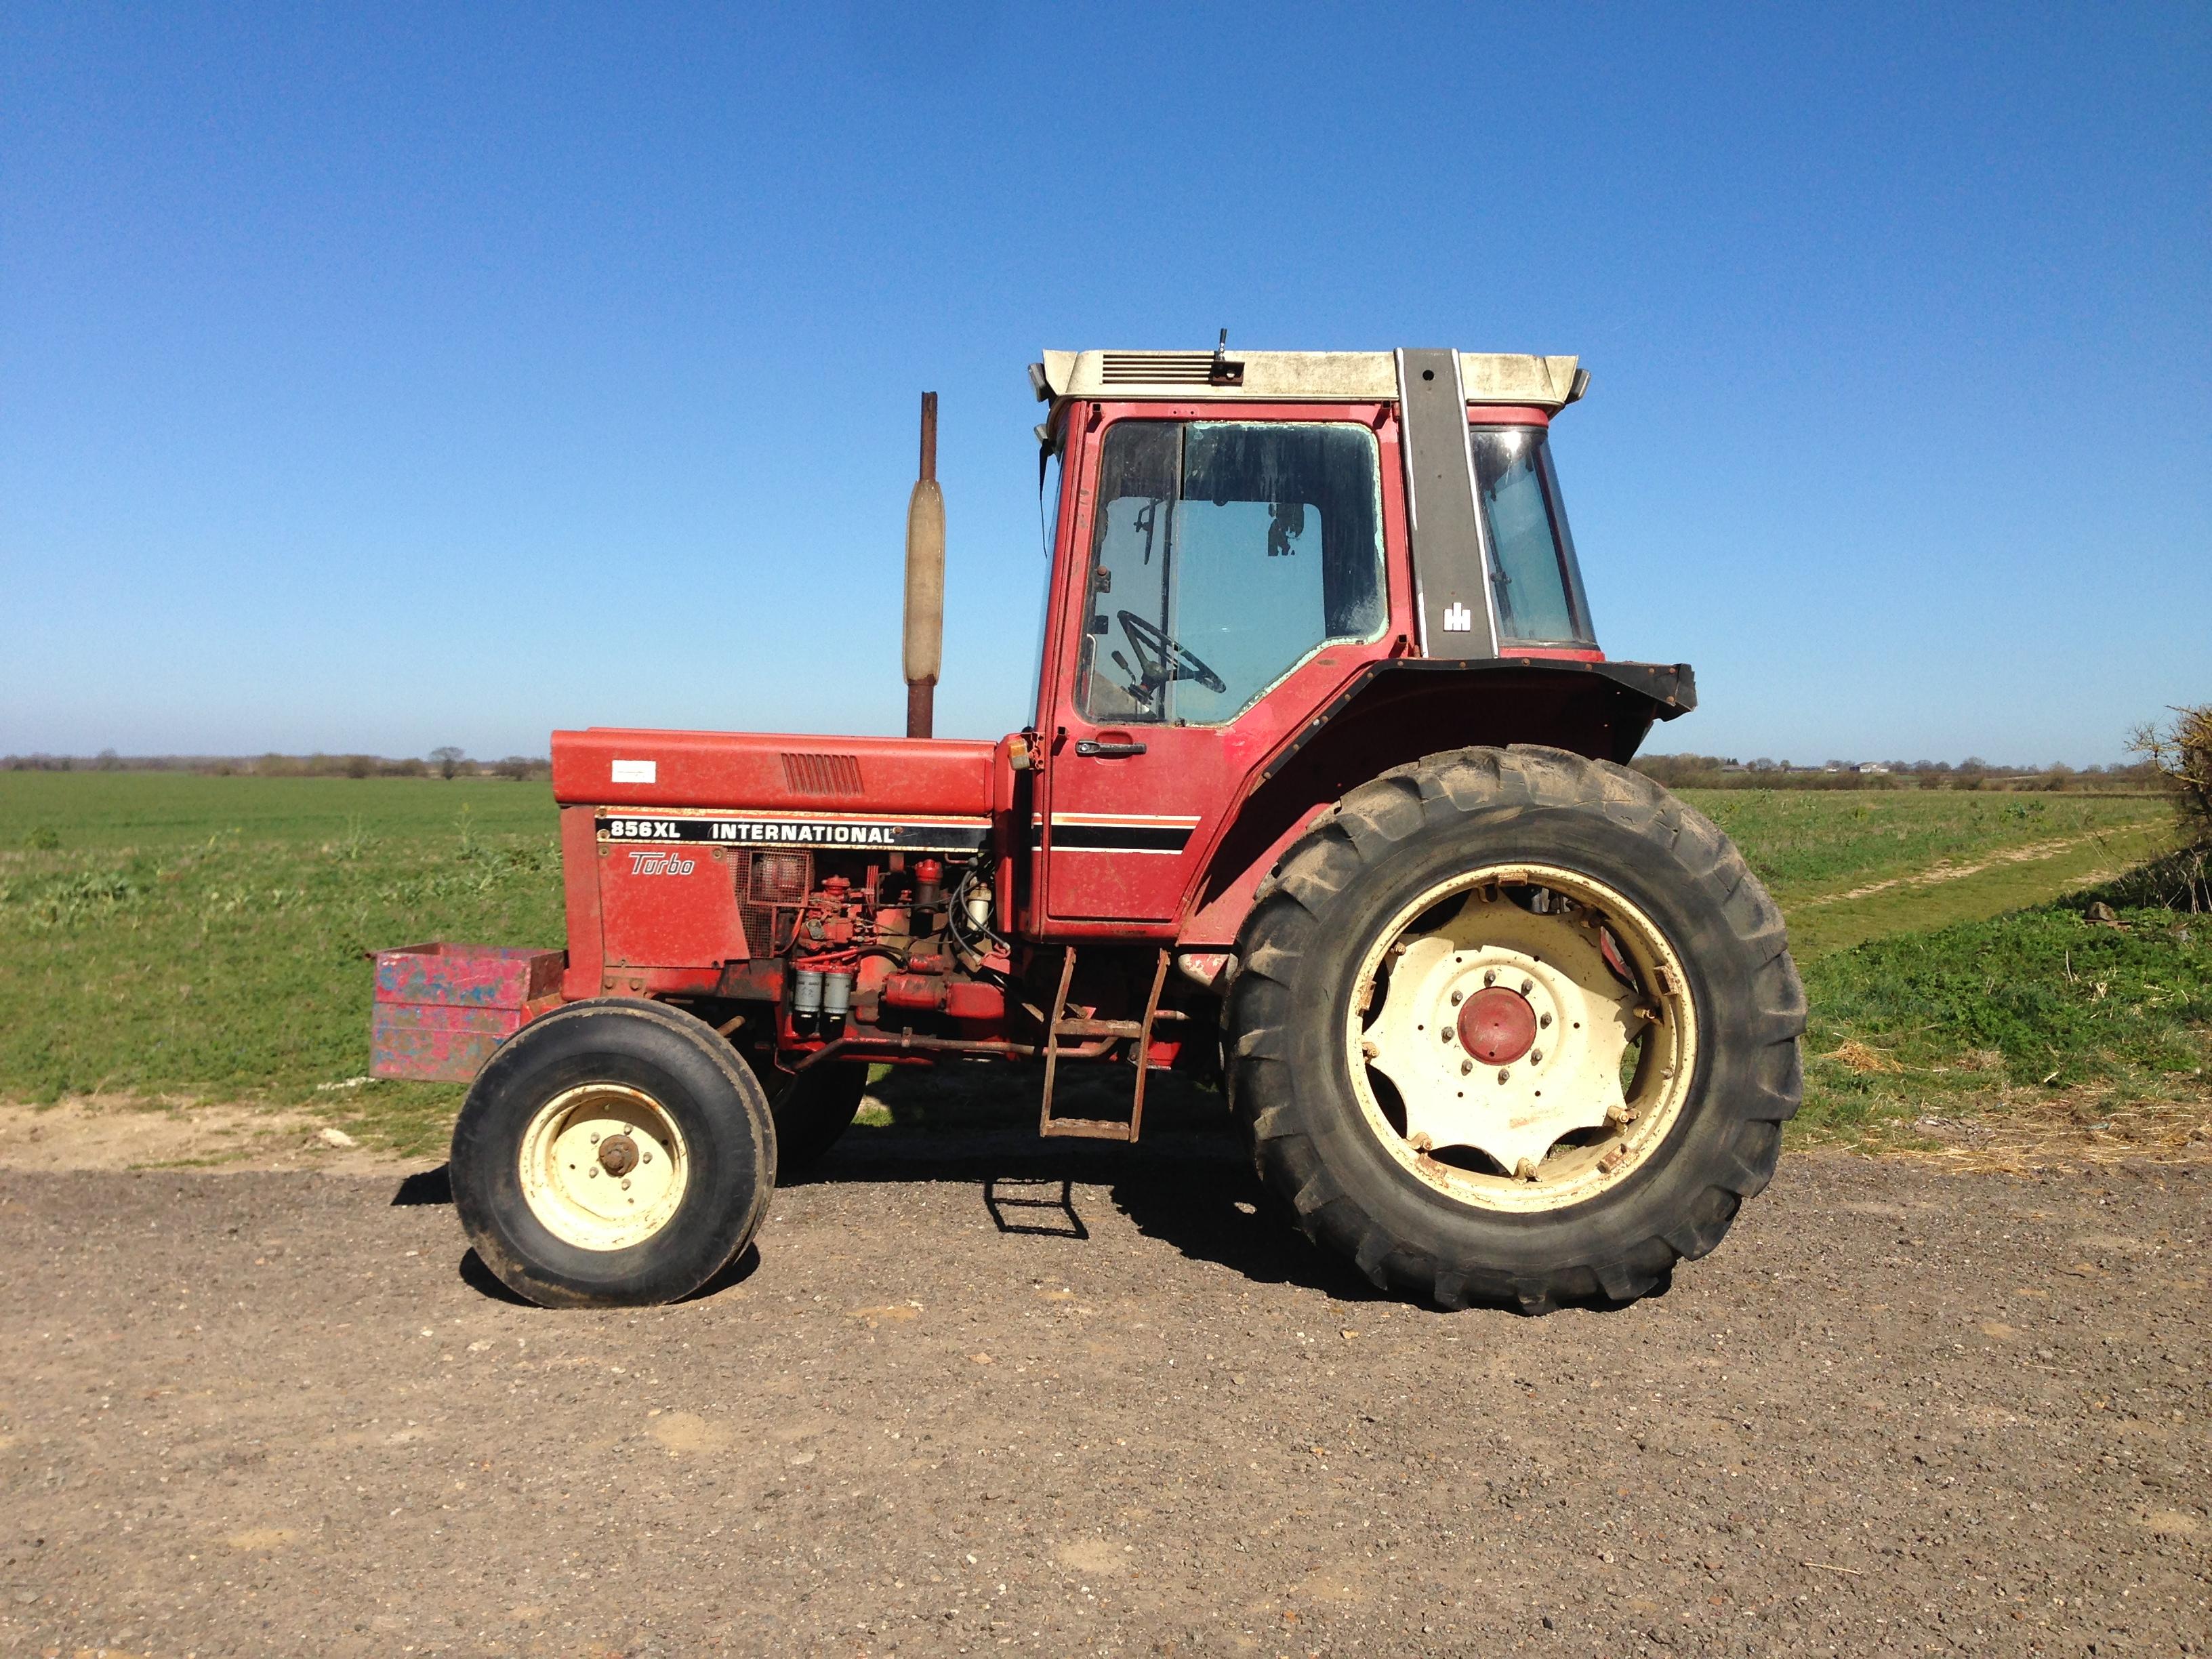 1985 international 856 xl turbo tractor used regularly. Black Bedroom Furniture Sets. Home Design Ideas